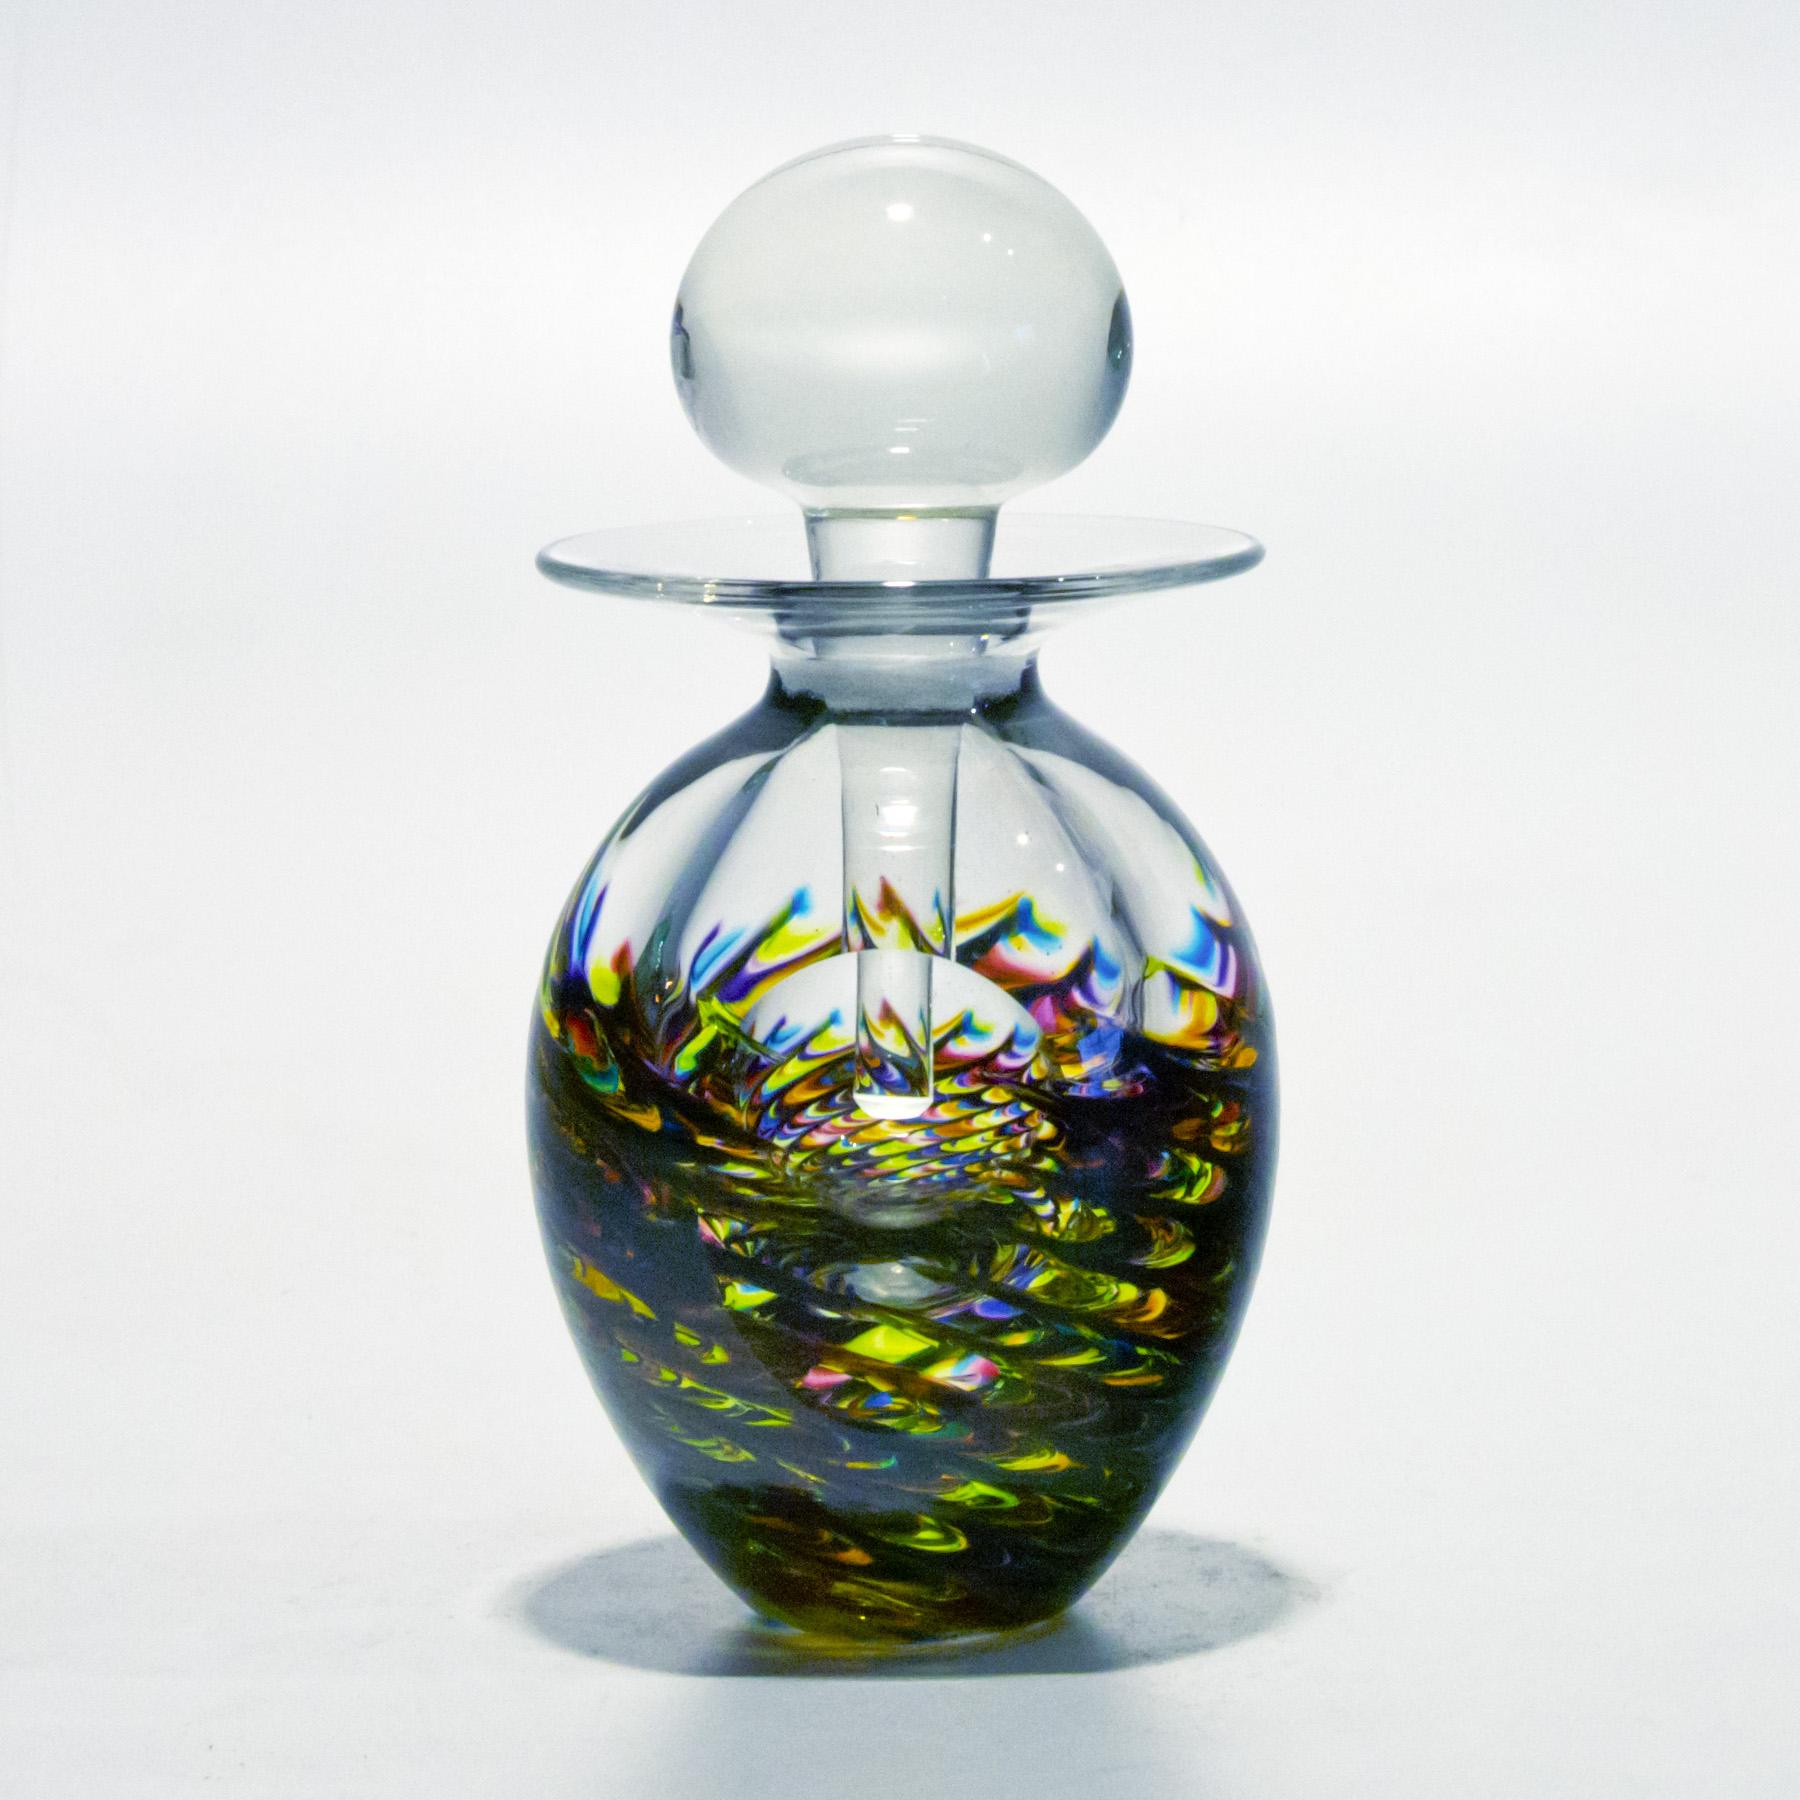 Colorful Perfume Bottles Lush By Michael Trimpol